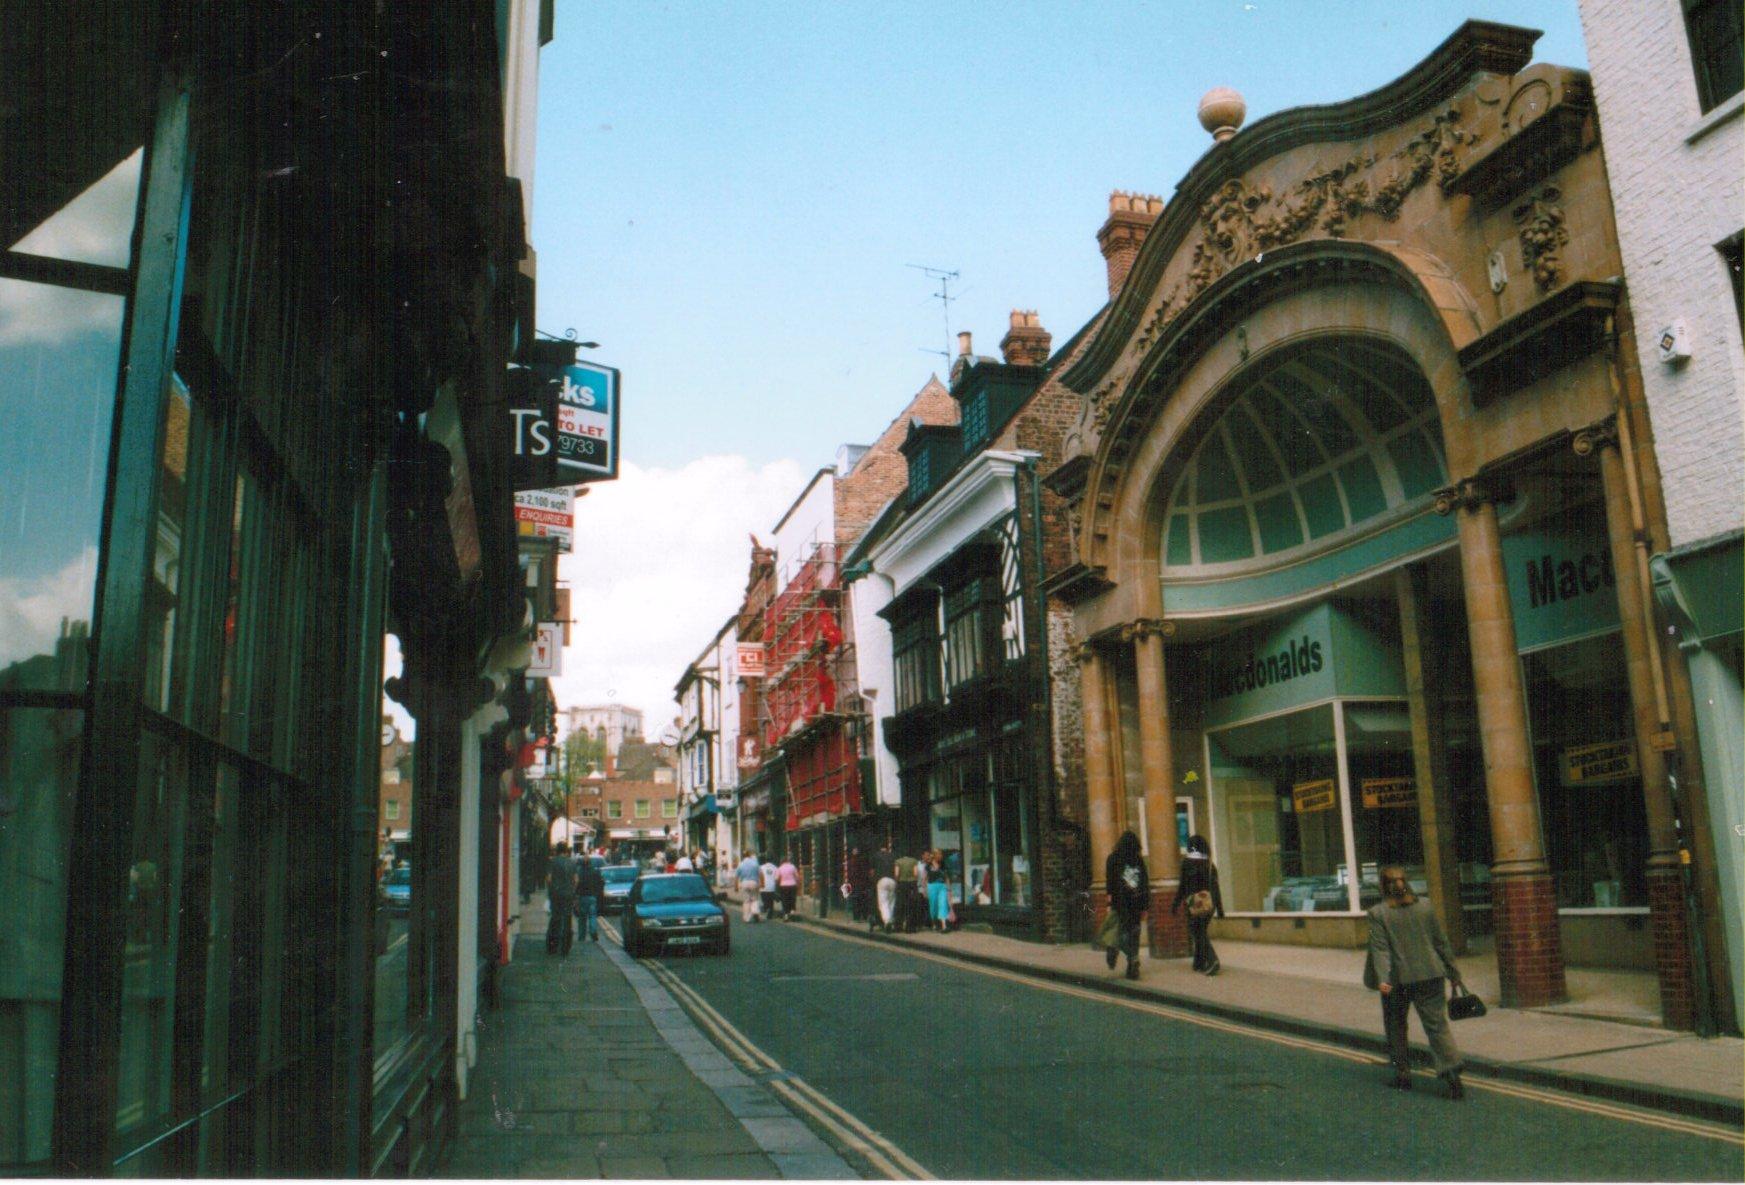 York's City Screen